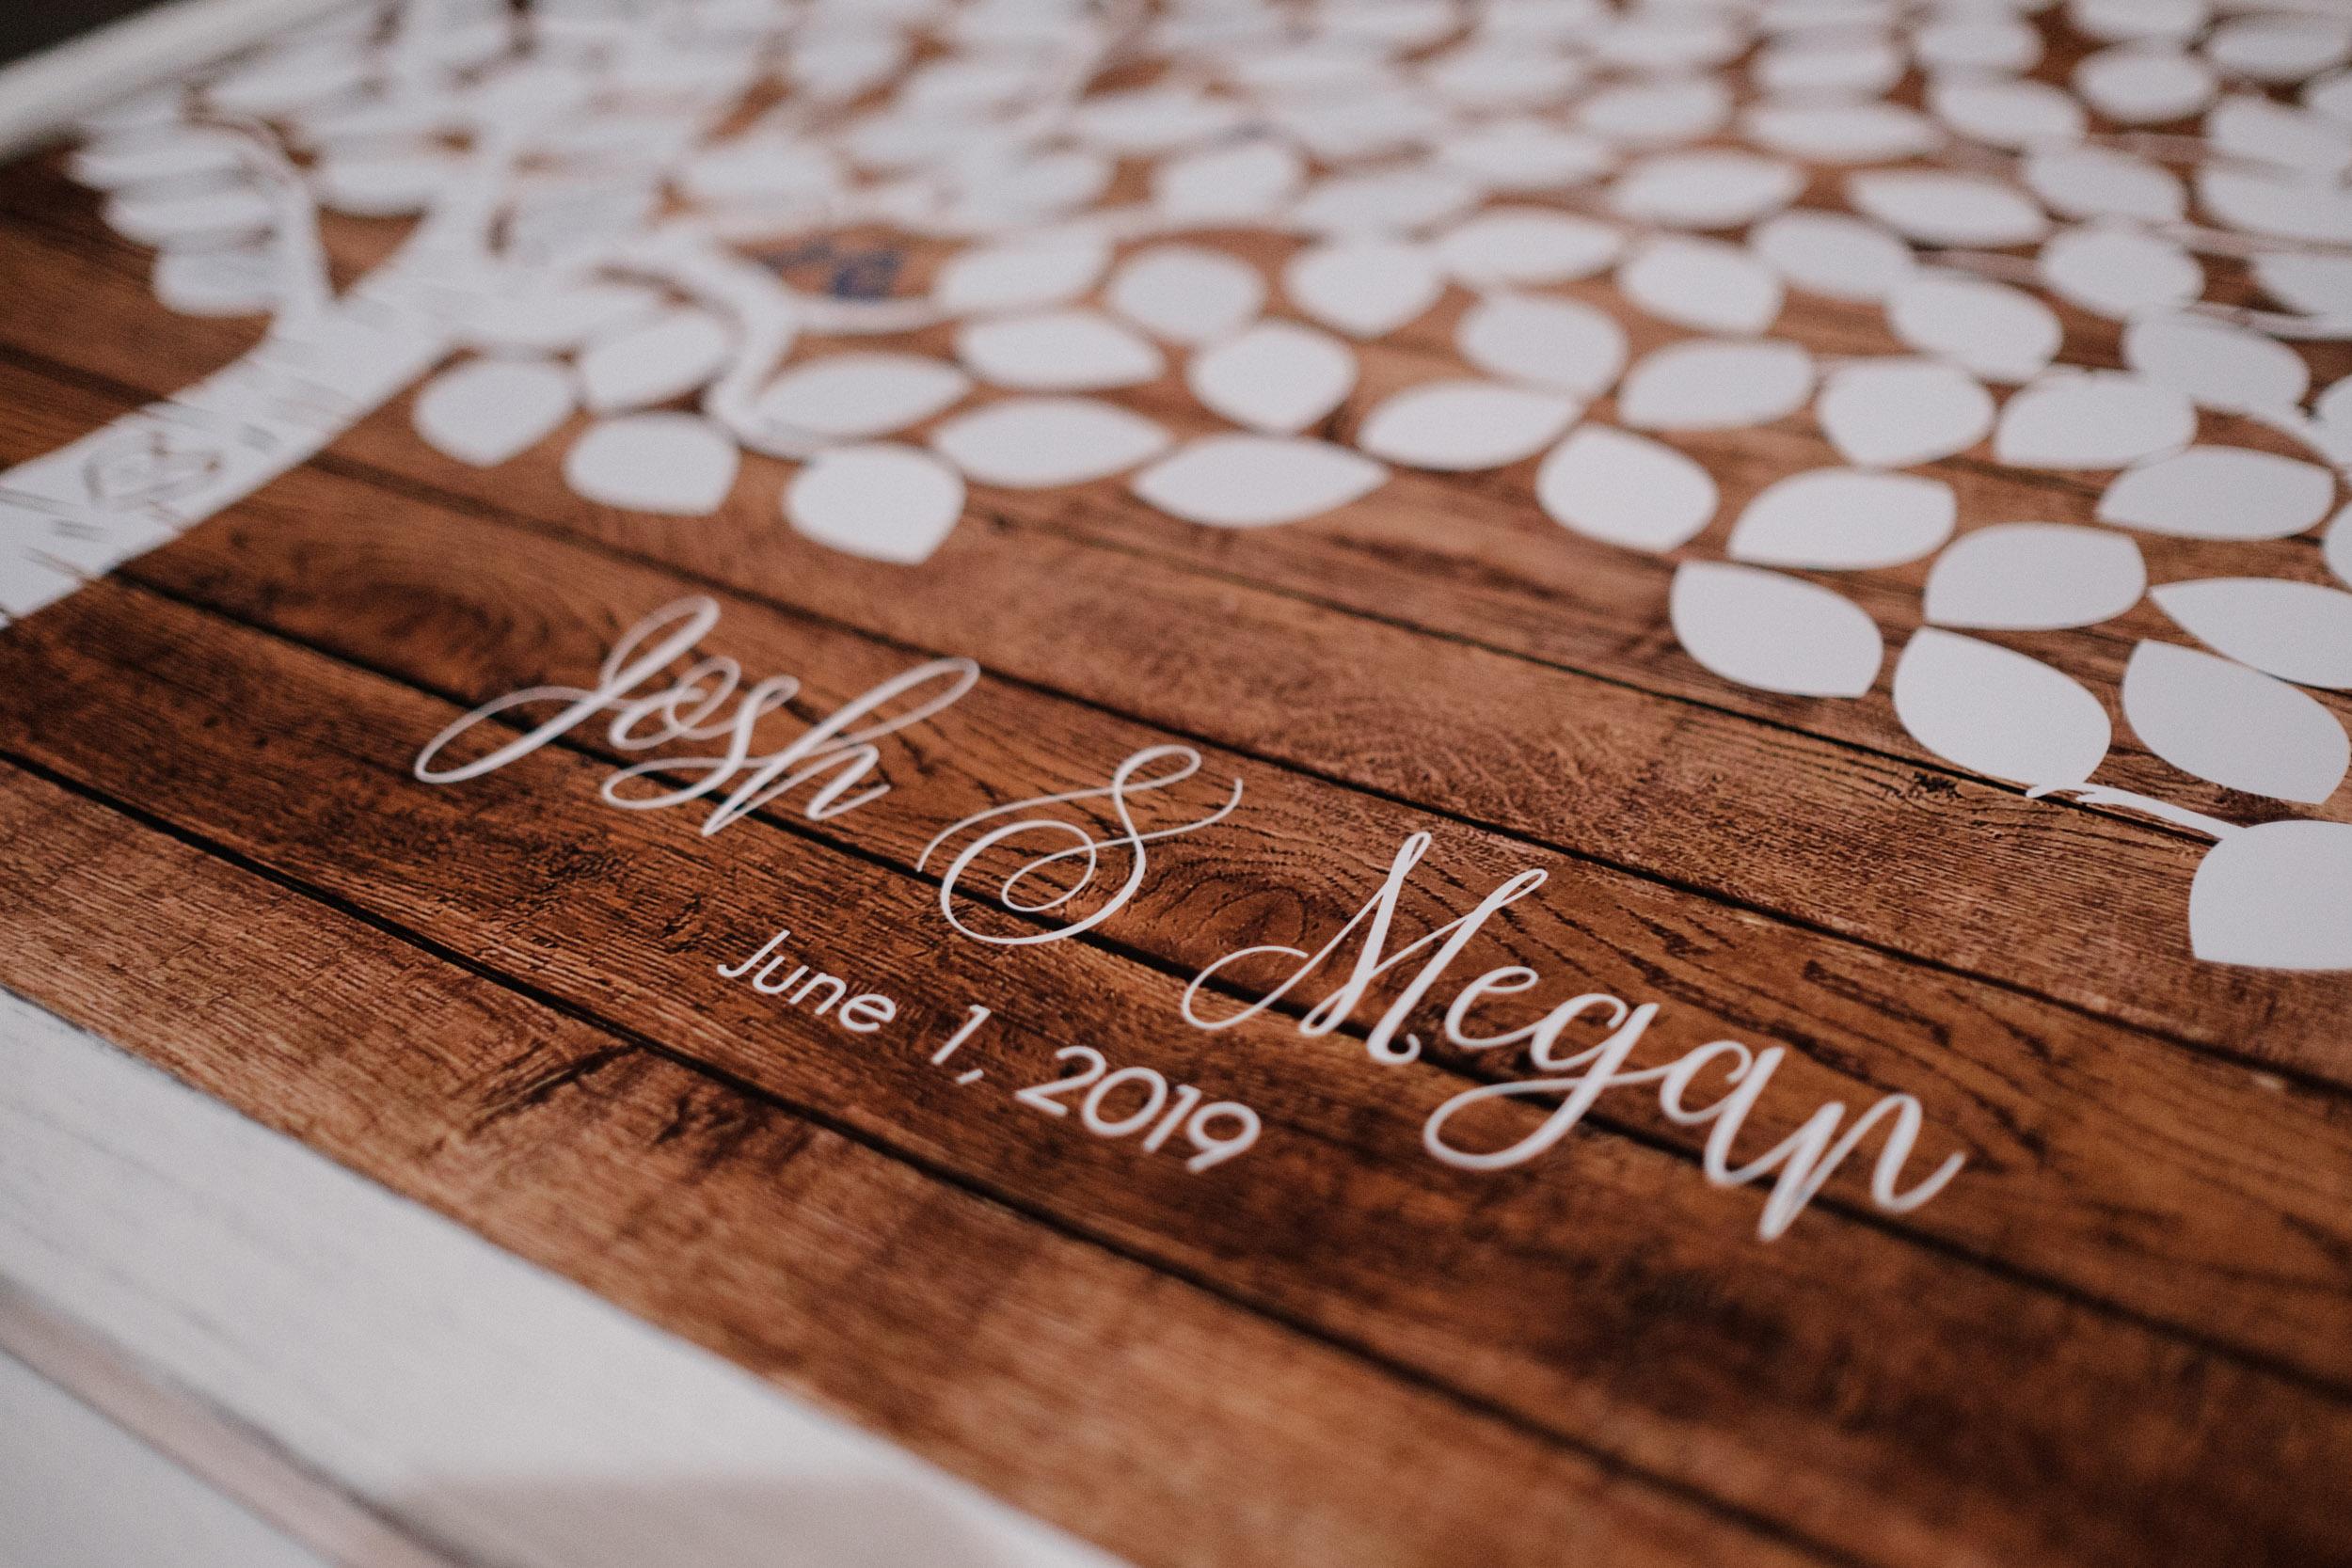 19-06-01 Megan Josh - Nicholas Conservatory Wedding-58.jpg